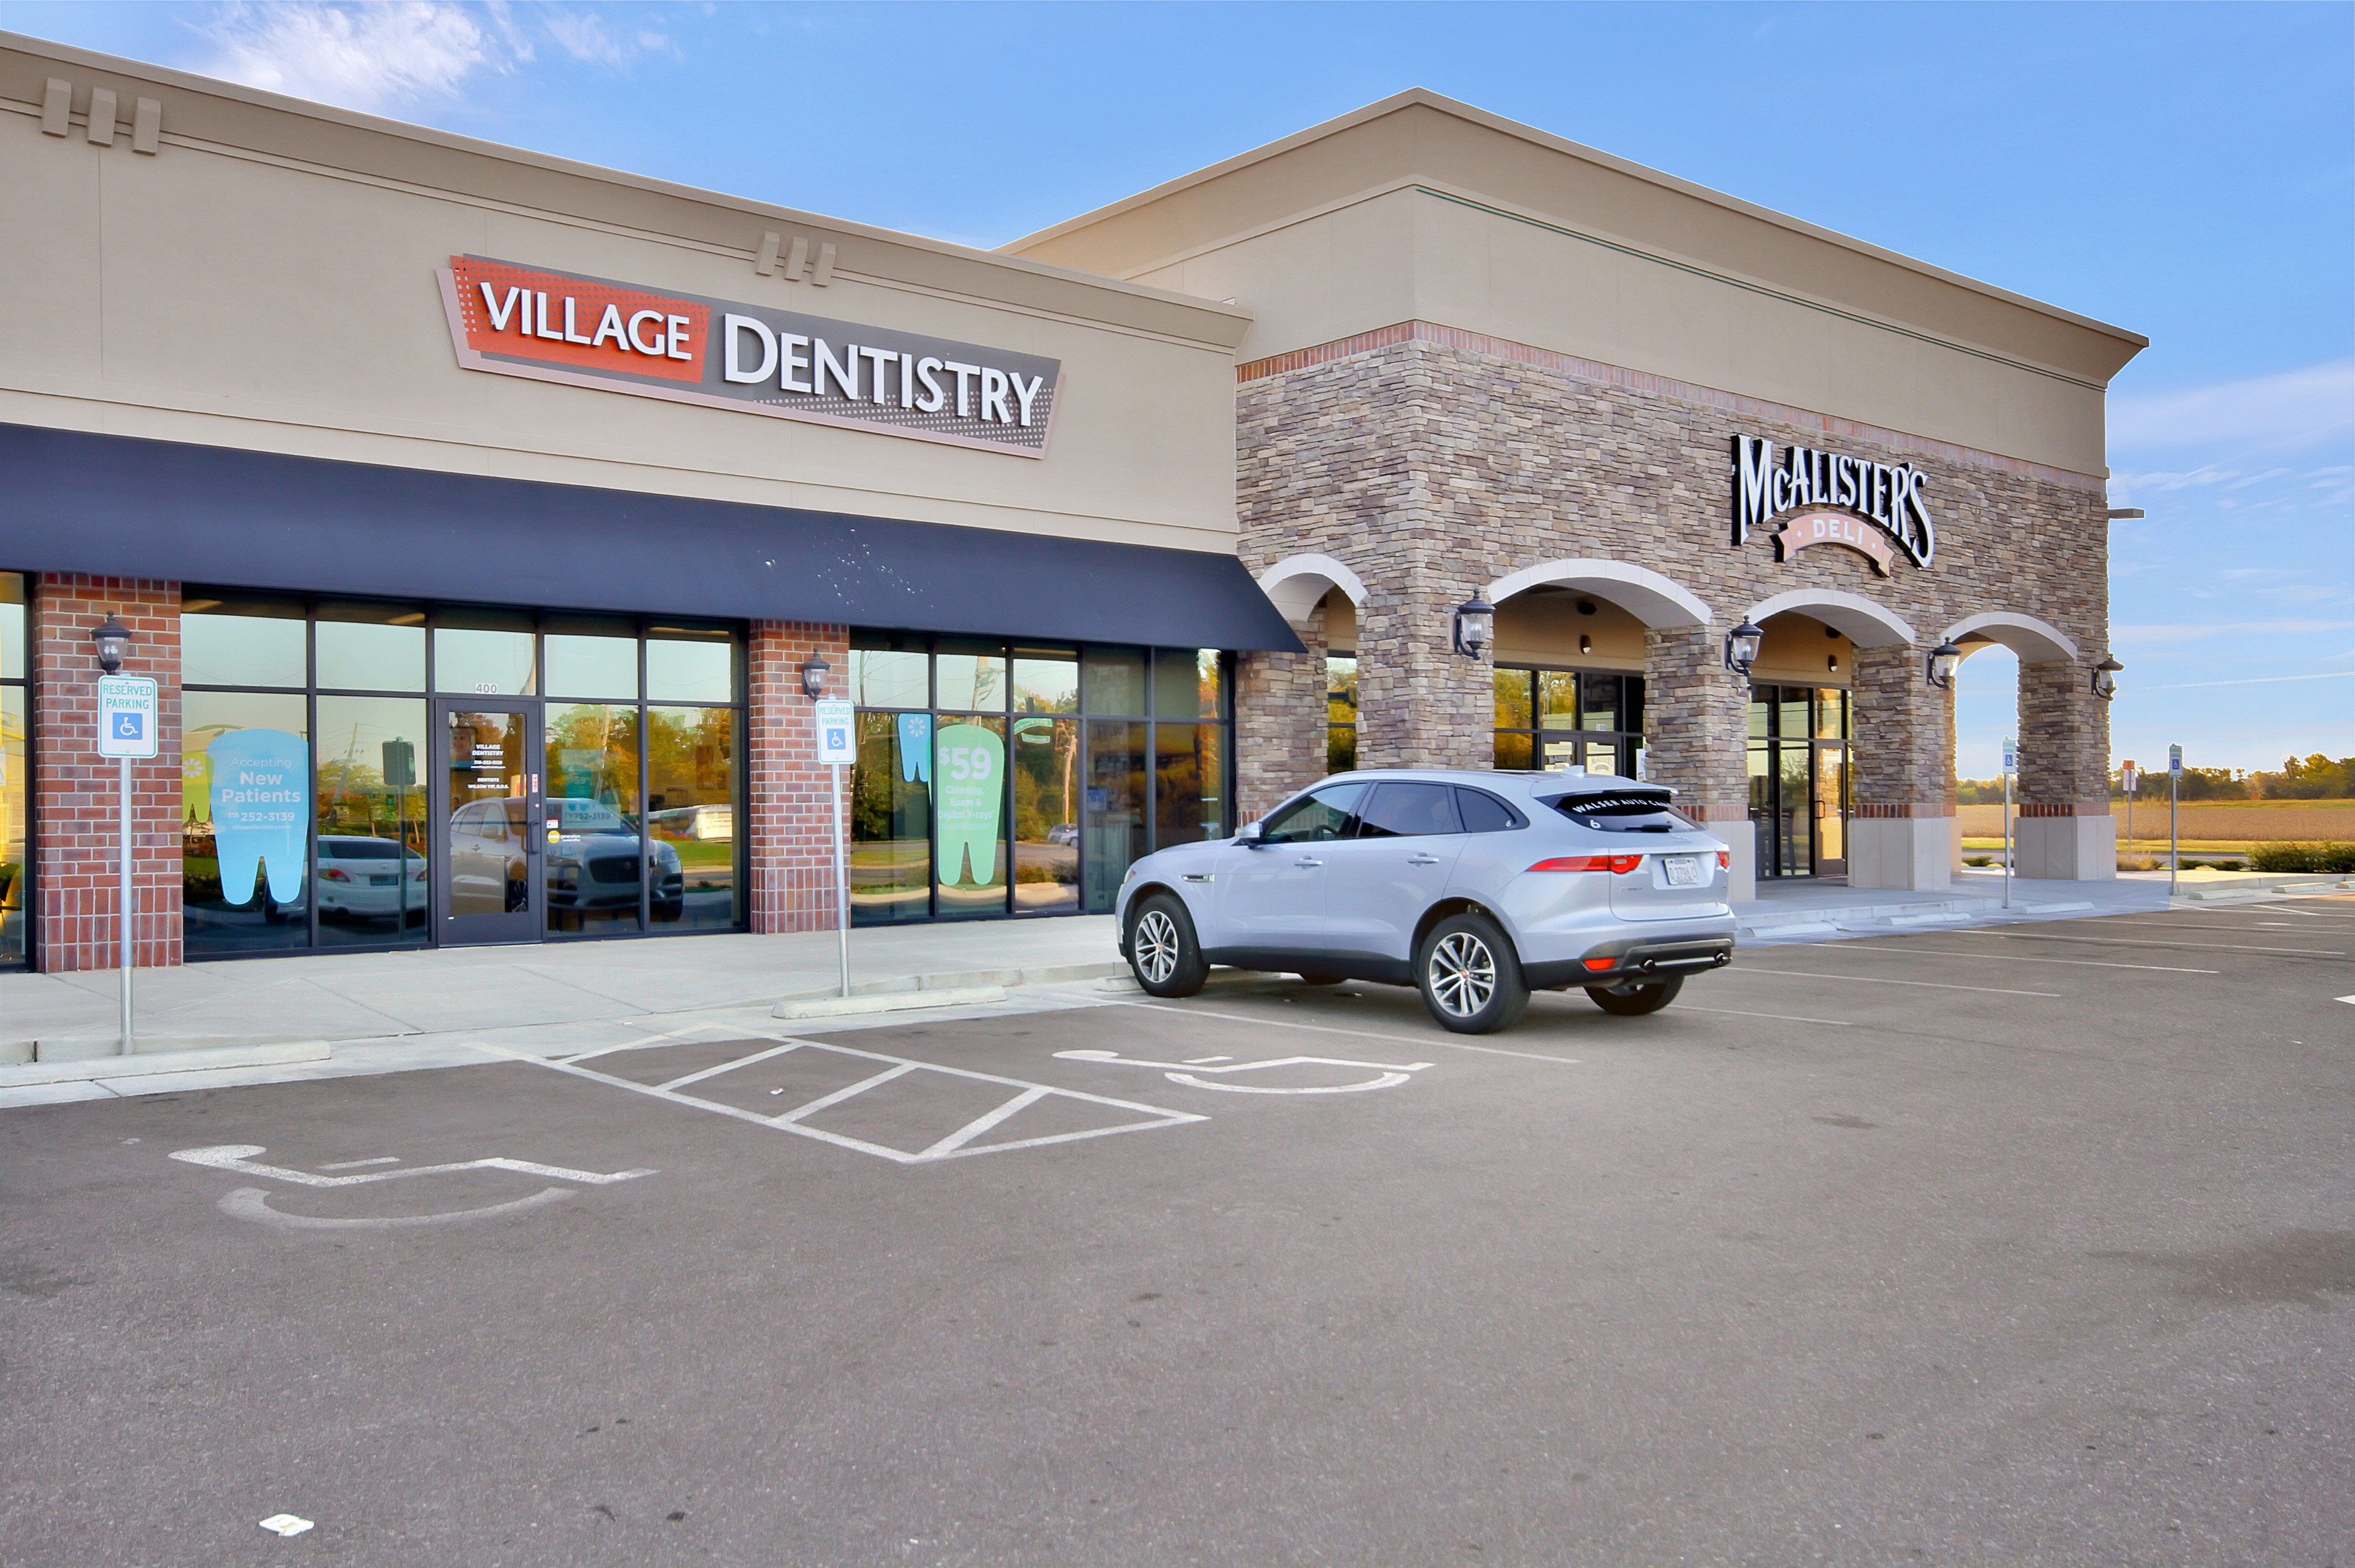 Village Dentistry image 4